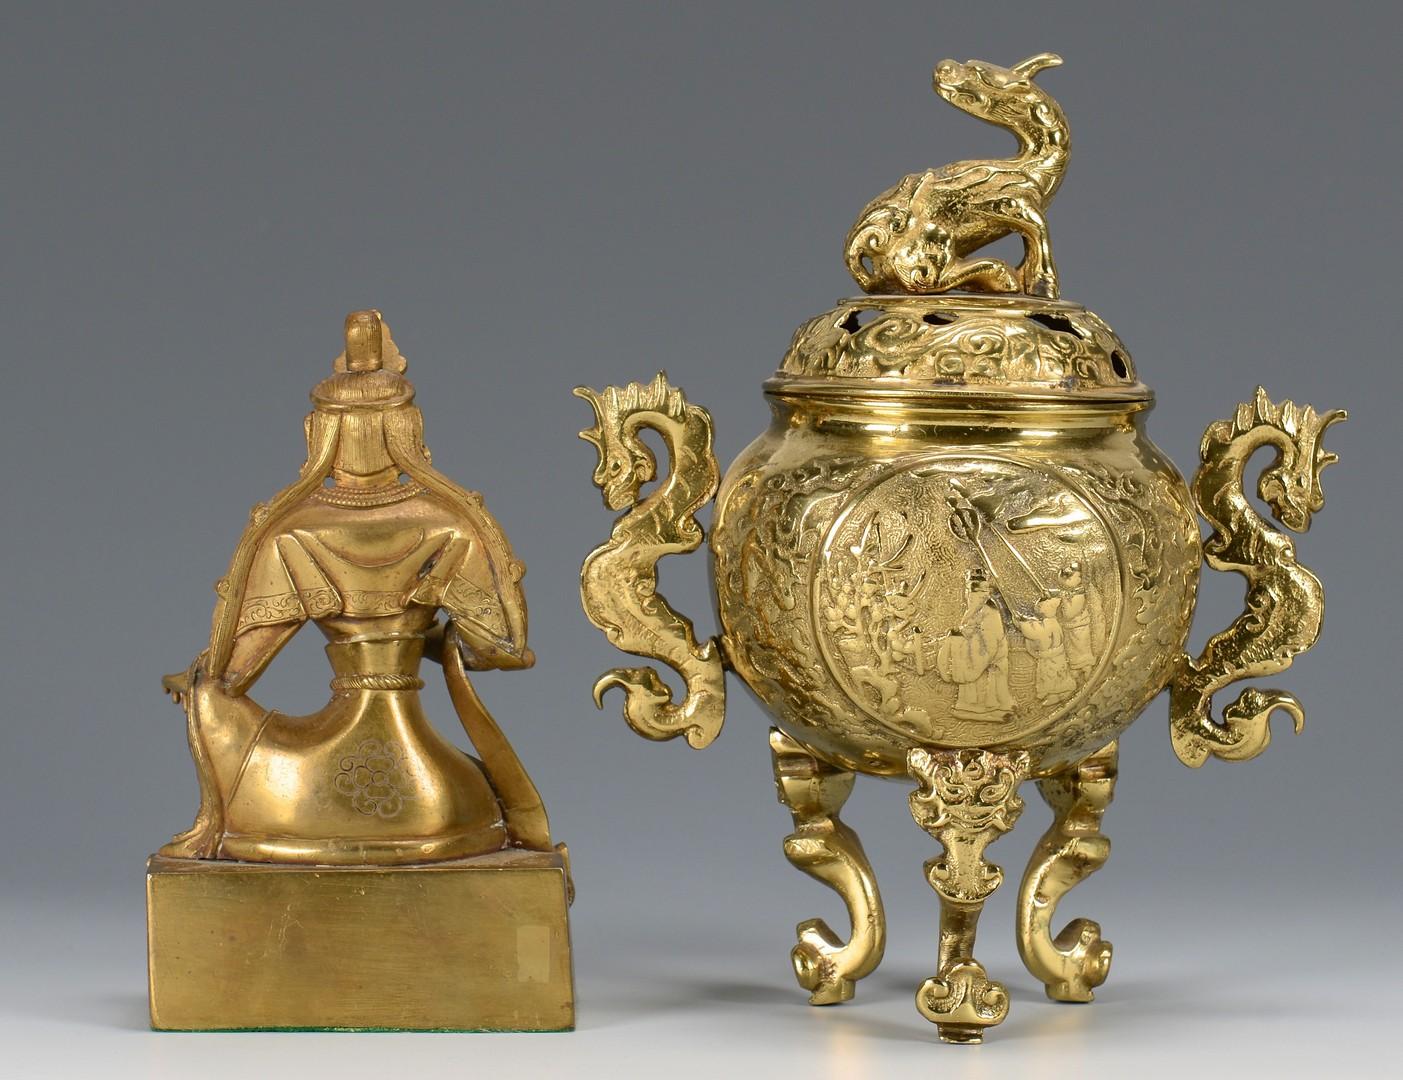 Lot 3594244: 2 Metal Asian Items, Censor & Figure